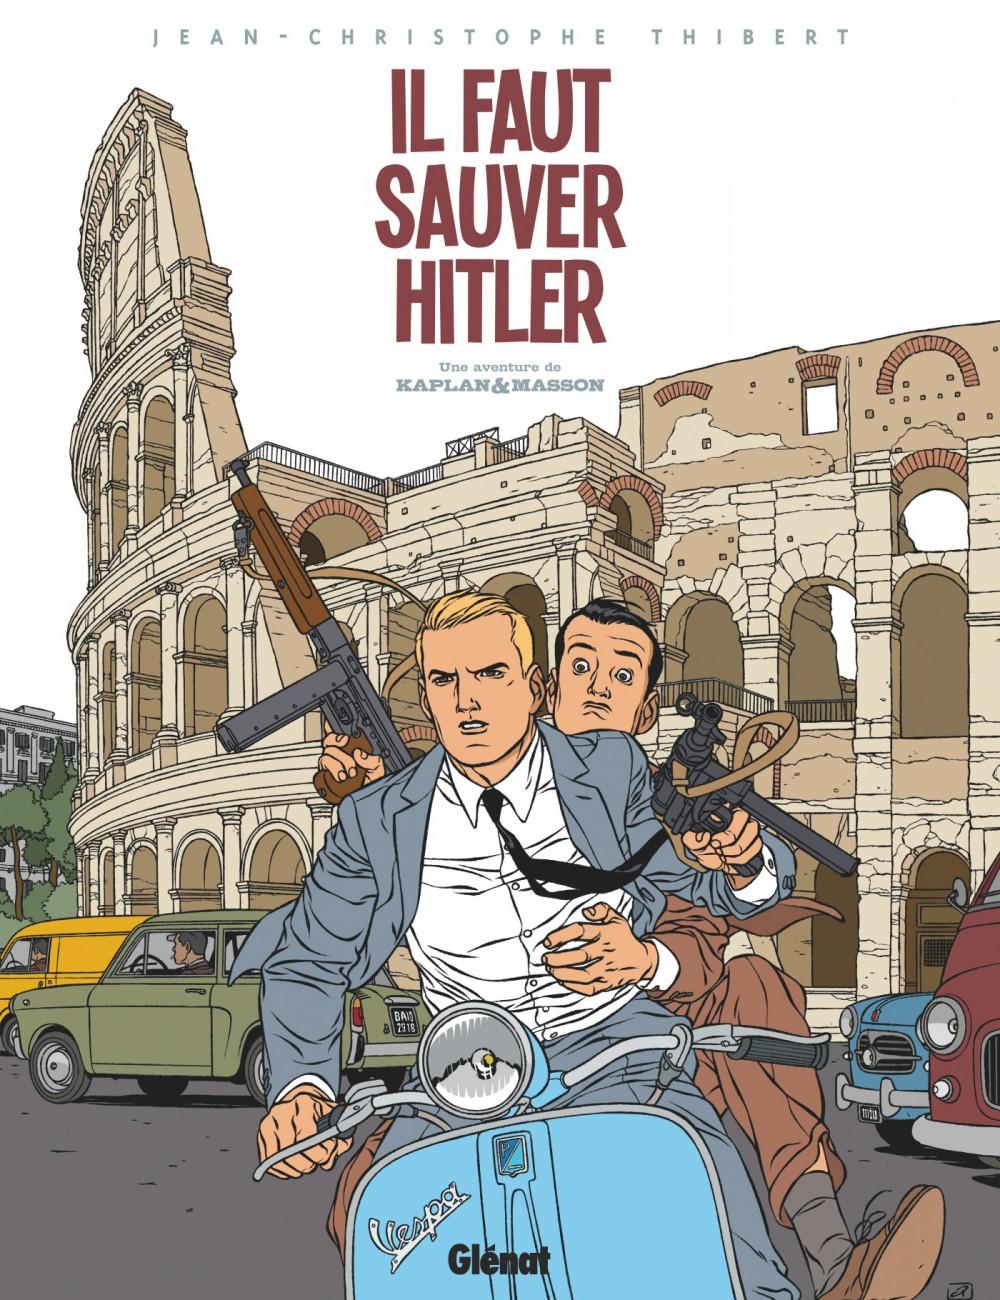 Kaplan & Masson, Il faut sauver Hitler, Jean-christophe Thibert, Glénat